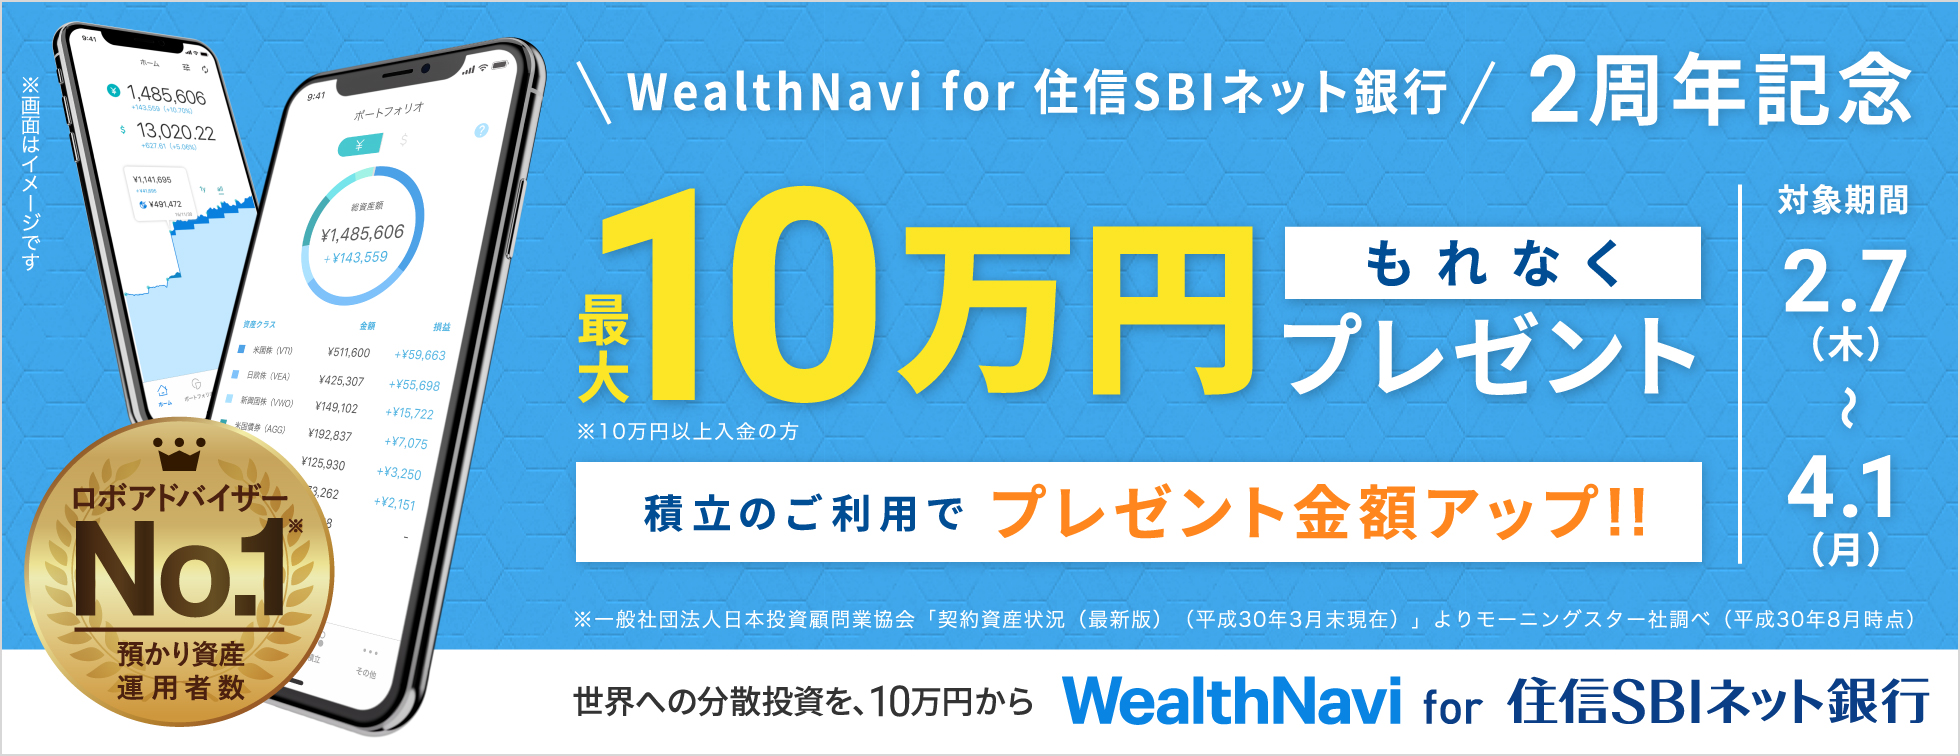 「WealthNavi for 住信SBIネット銀行」2周年記念 もれなく最大10万円プレゼントキャンペーン